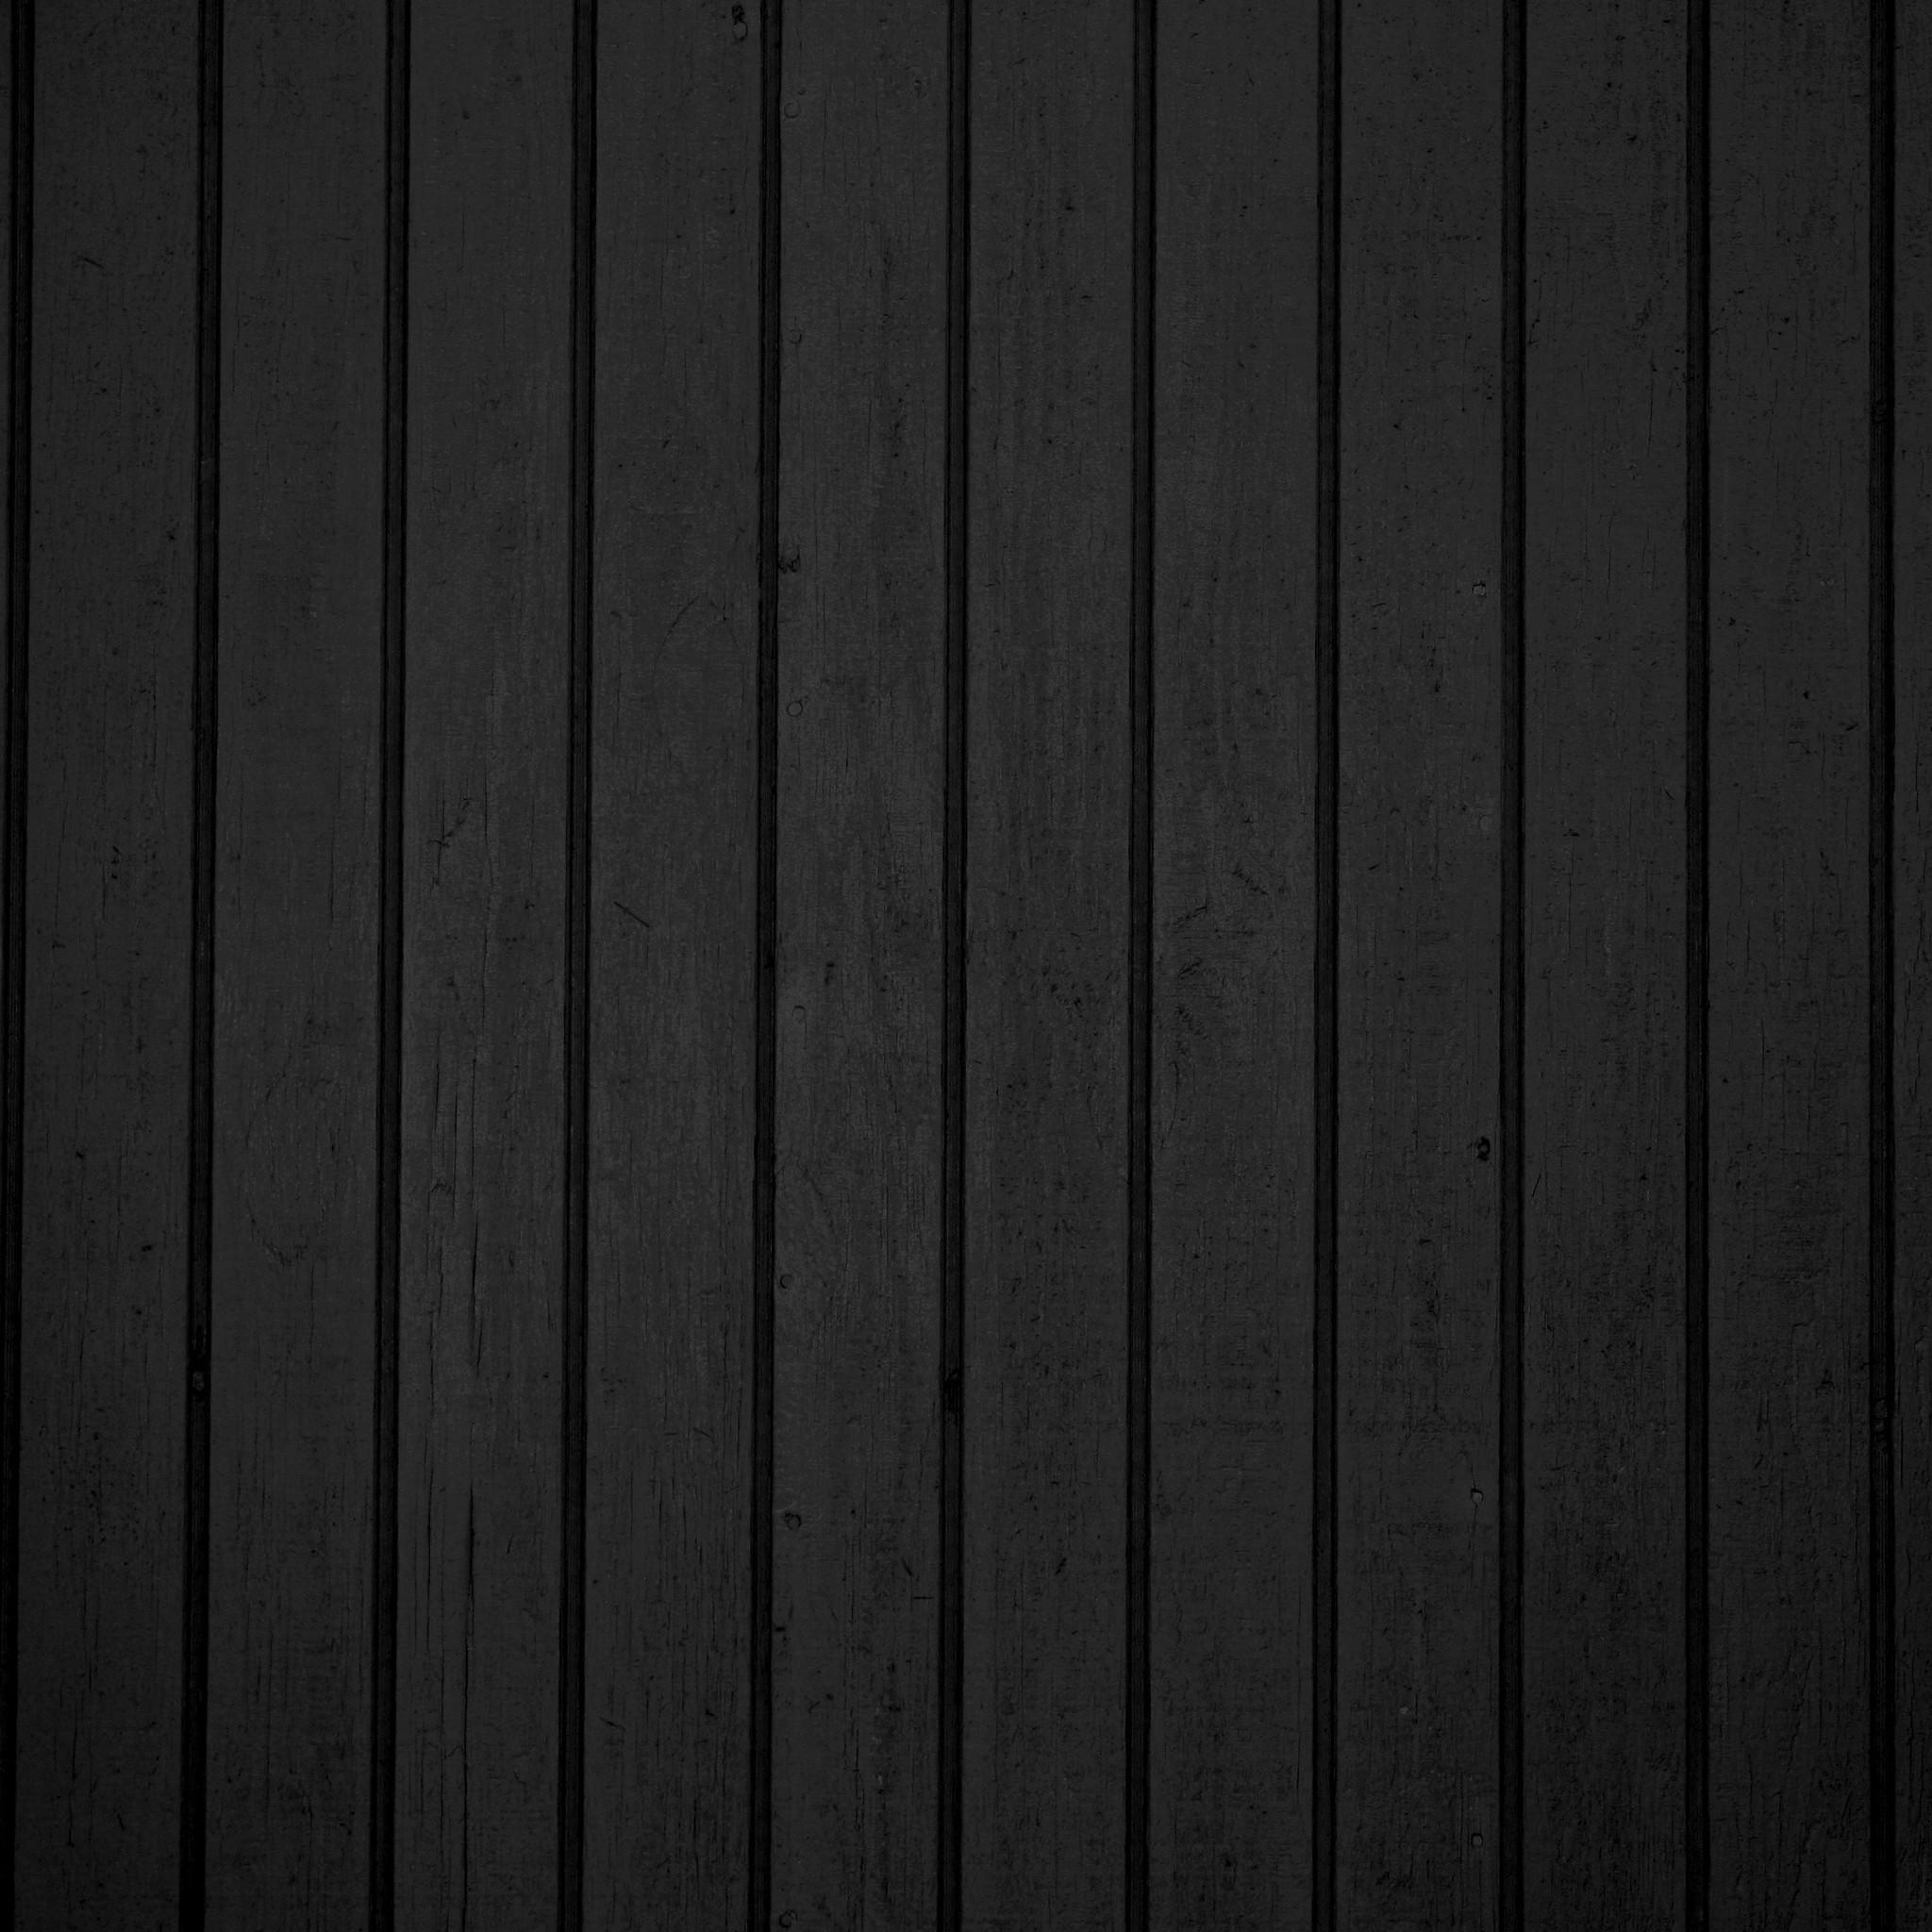 black wood textures the right da club. Black Bedroom Furniture Sets. Home Design Ideas